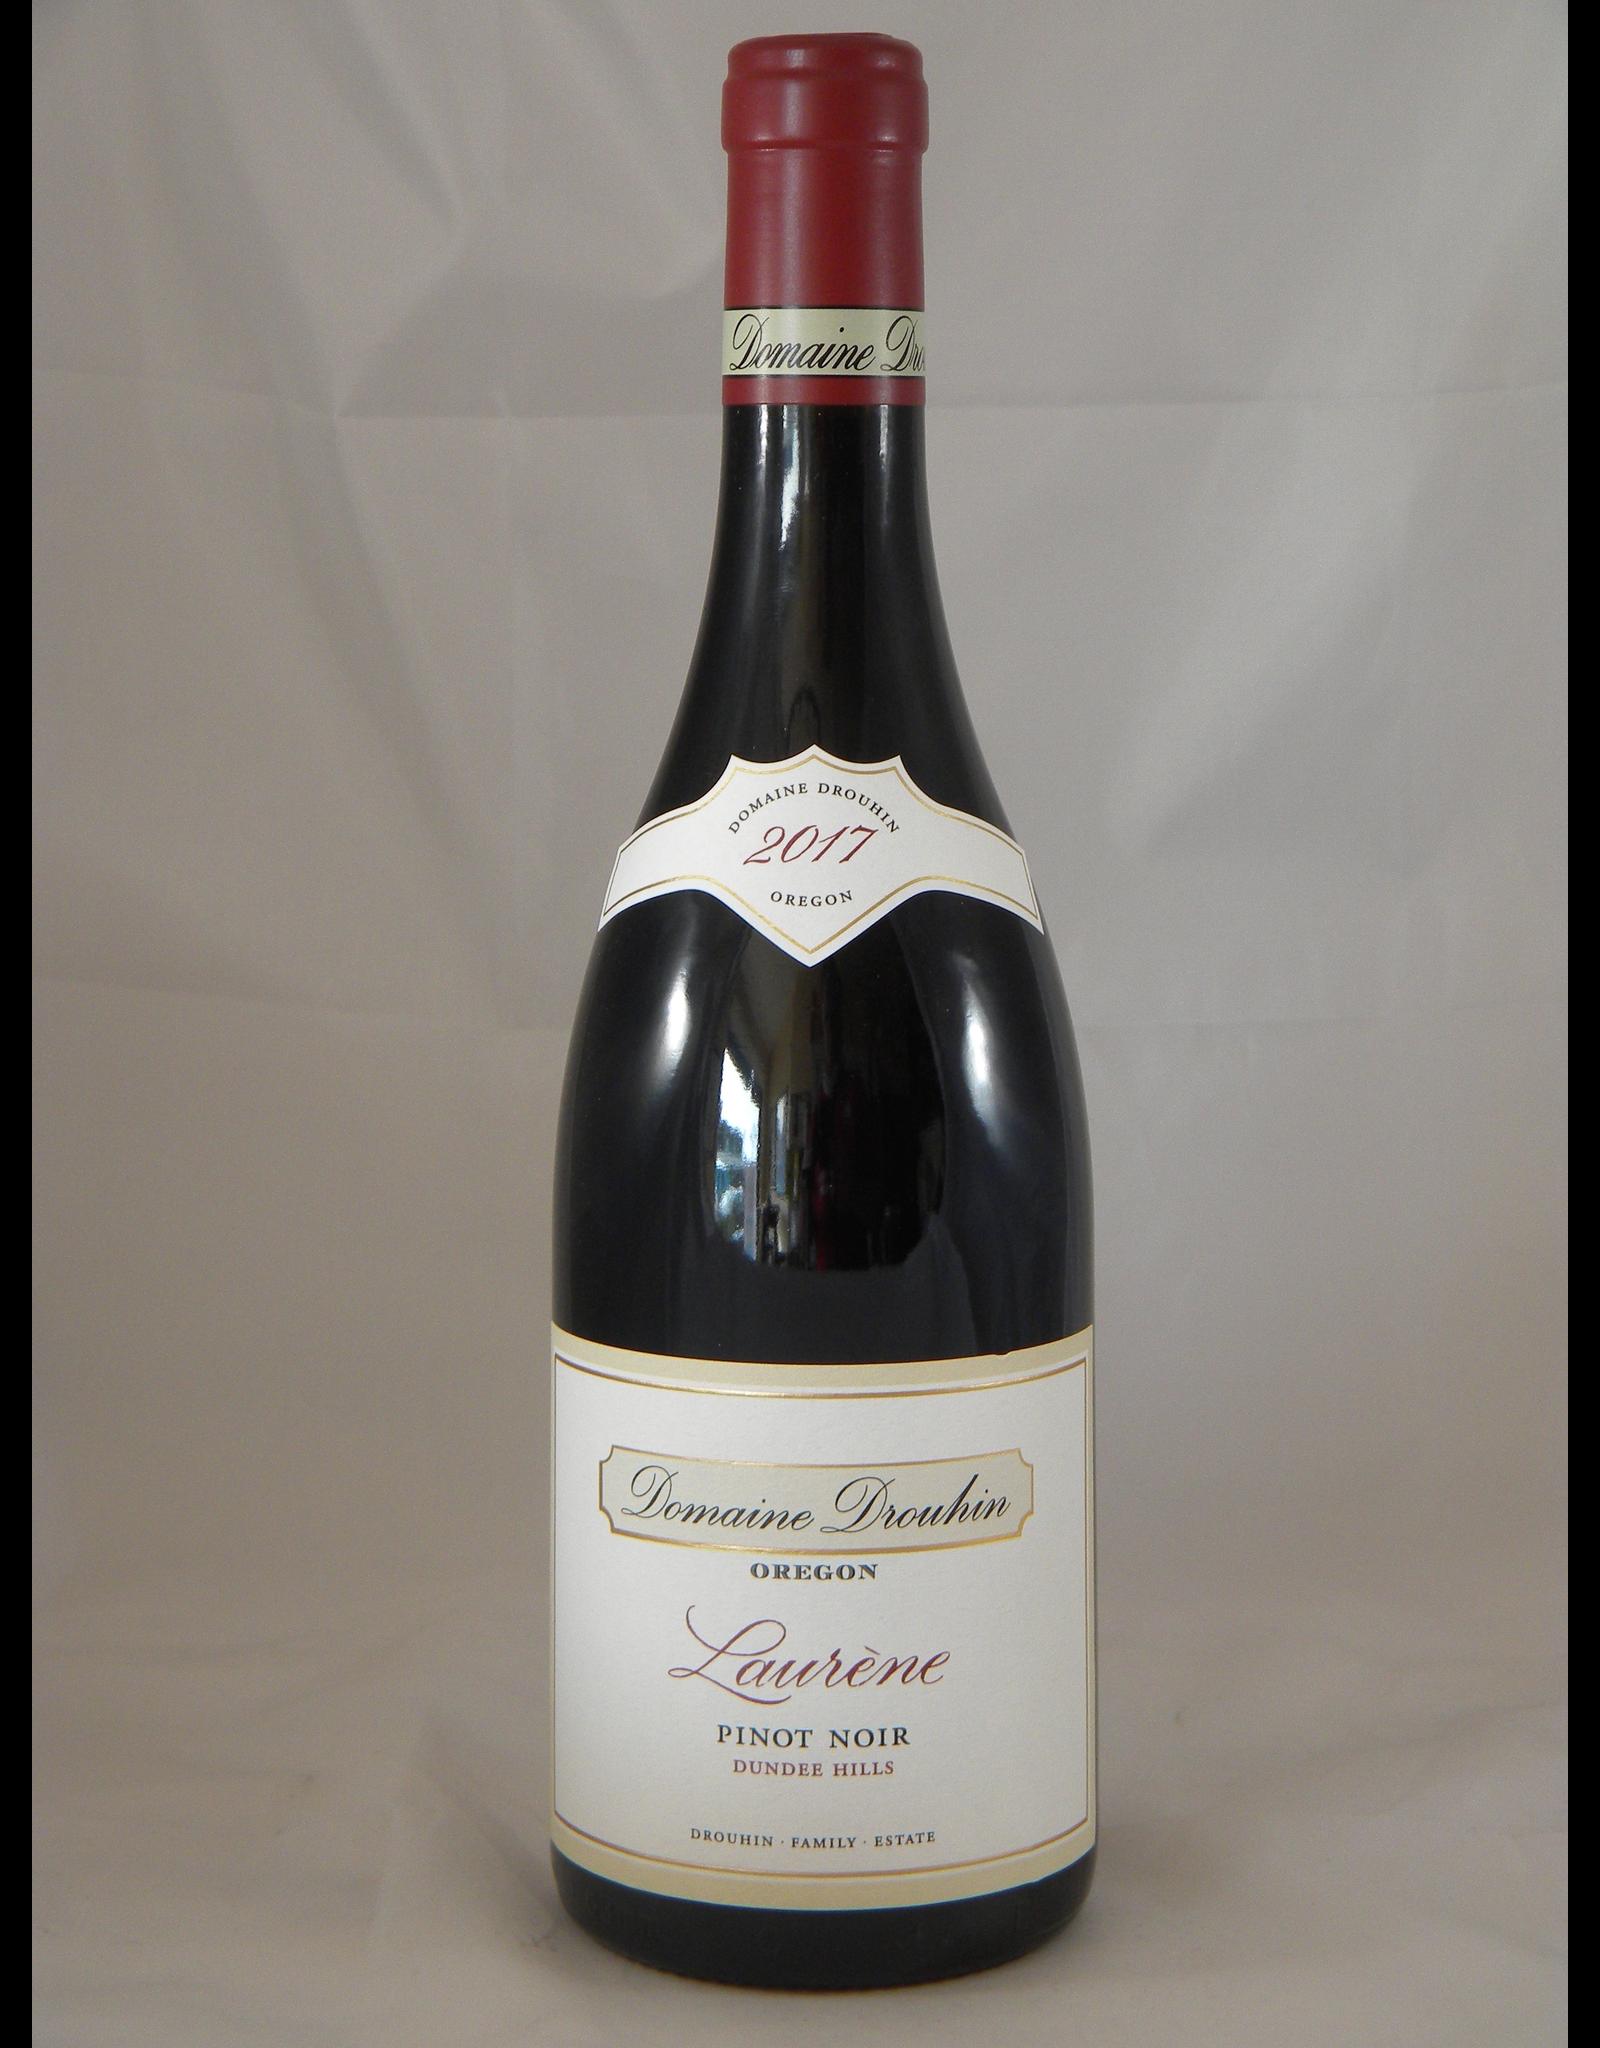 Drouhin Domaine Drouhin Pinot Noir Dundee Hills Laurene 2017